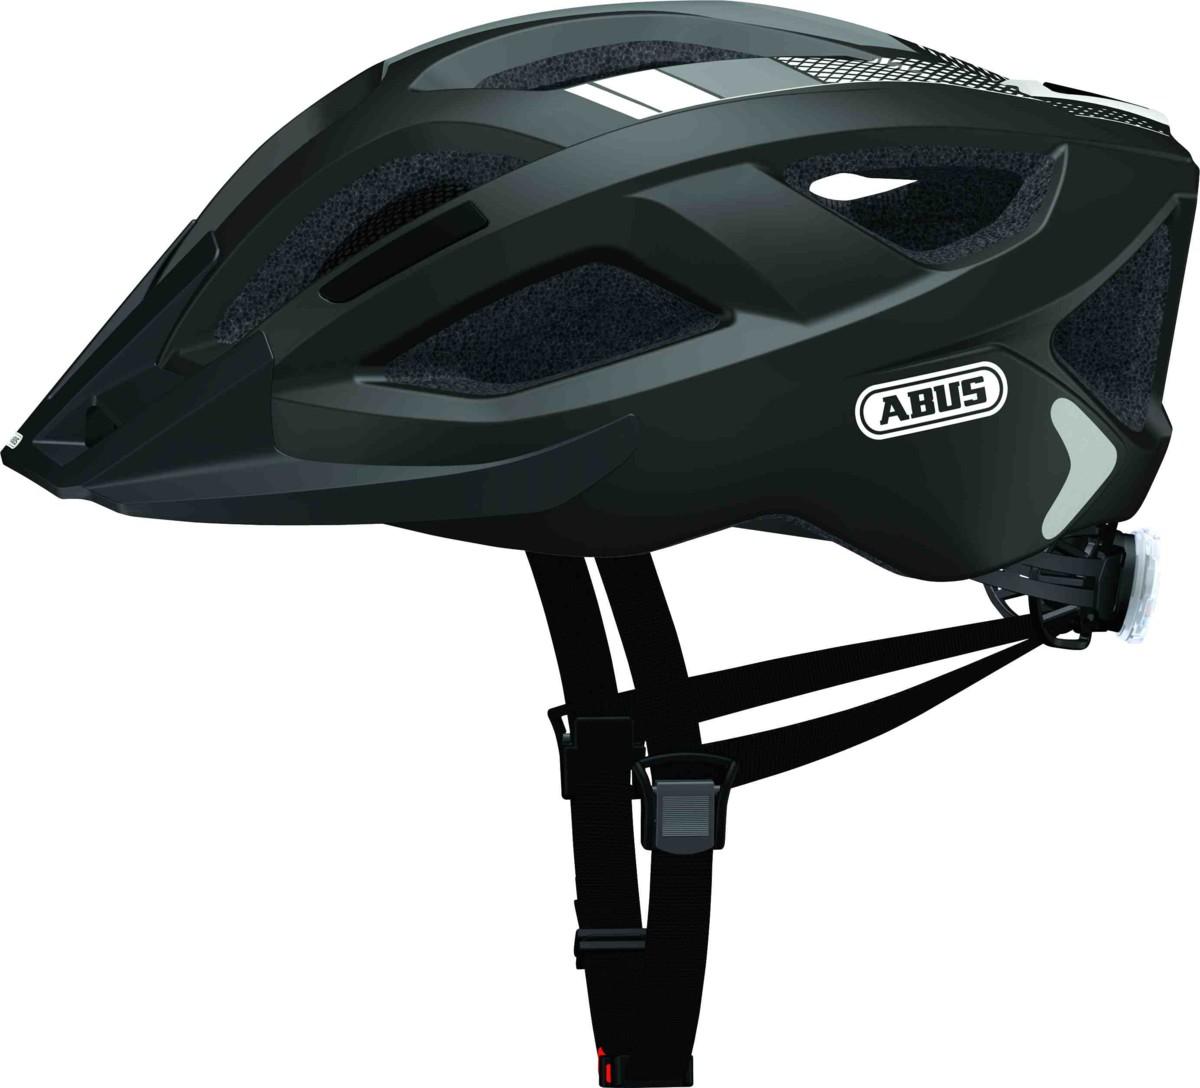 Aduro 2.0 race black - Aduro 2.0 race black L